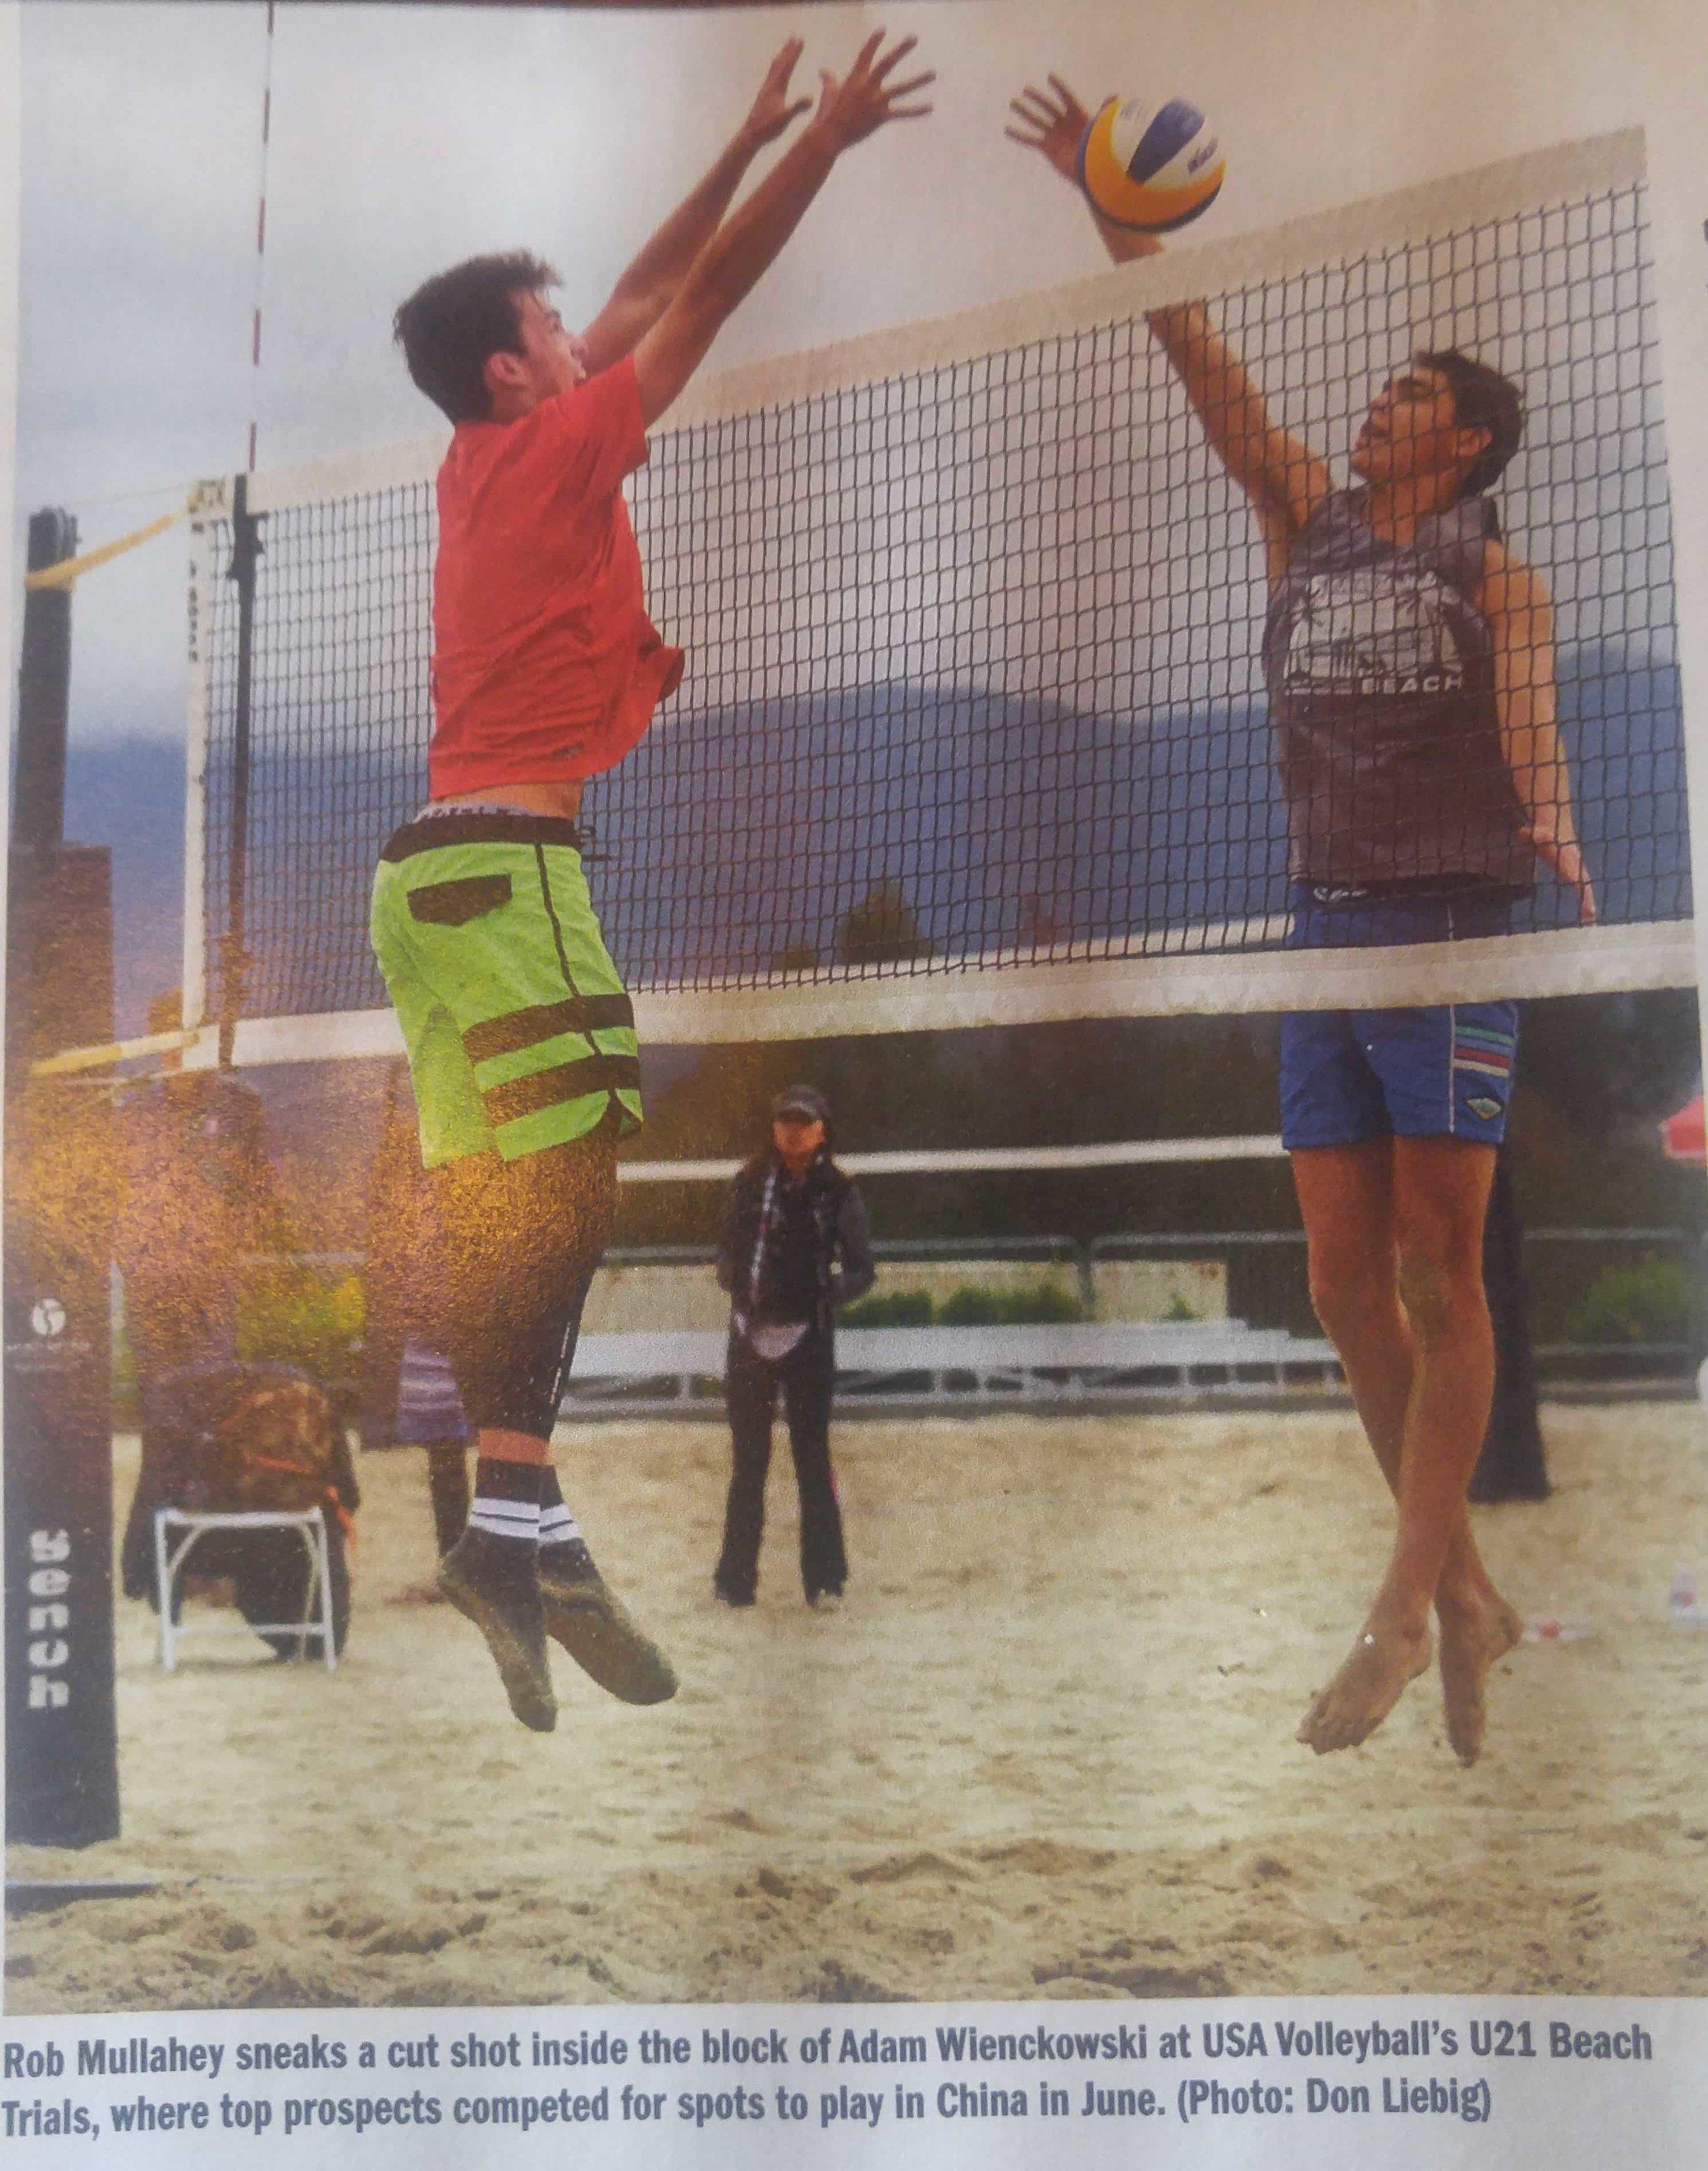 Adam wienkowski block jumps with great form.